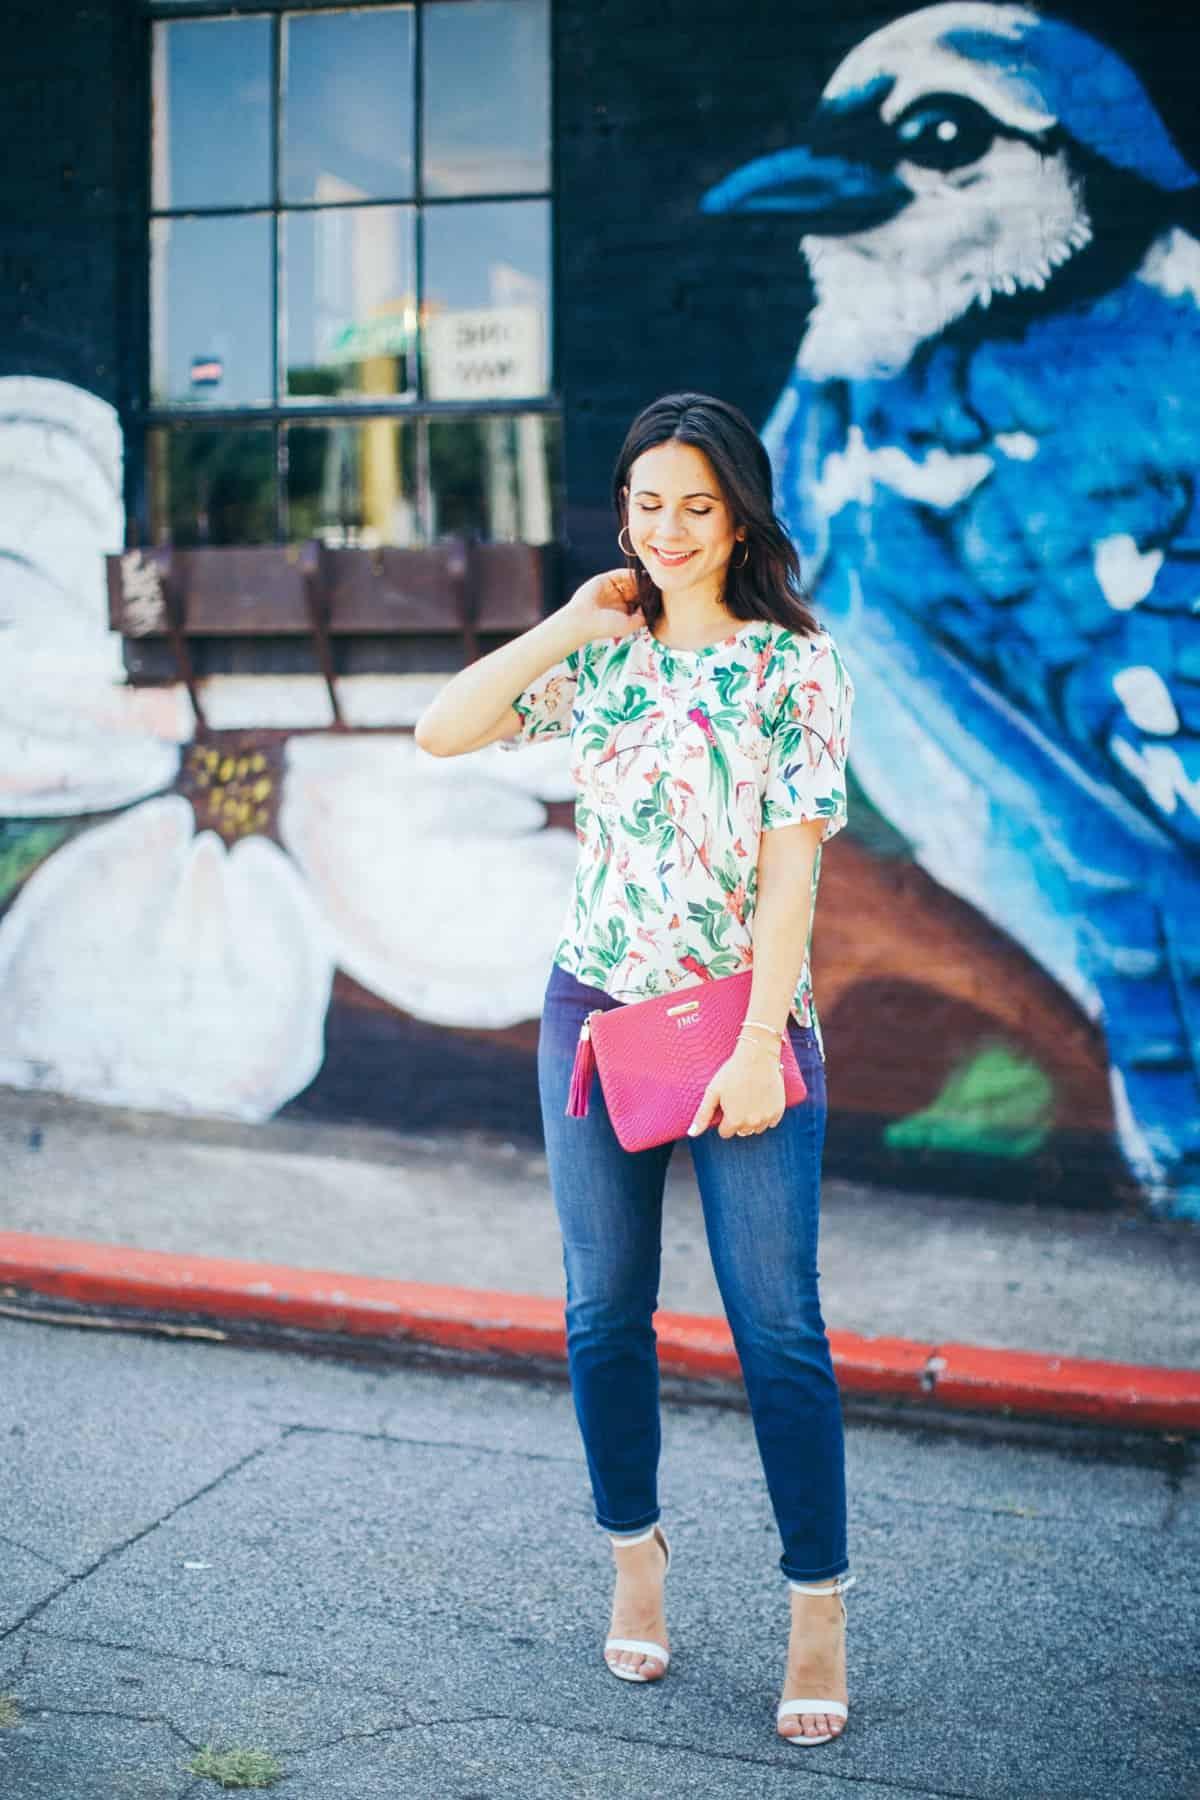 nydj cool embrace - summer date night outfit ideas - My Style Vita @mystylevita 6